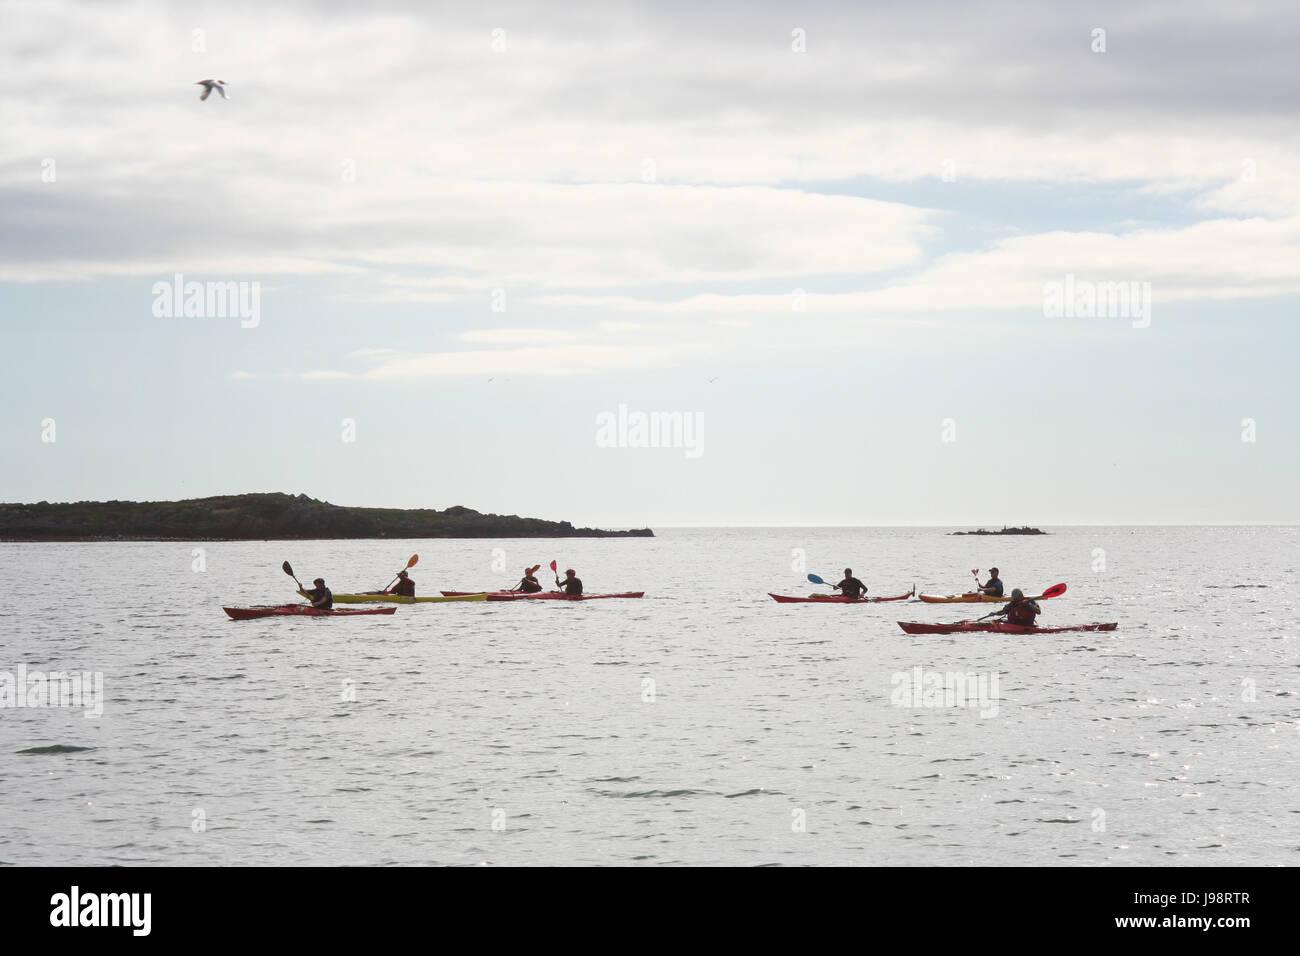 Grupo , kayak canoa en la Bahía de Dublín, Irlanda Foto de stock